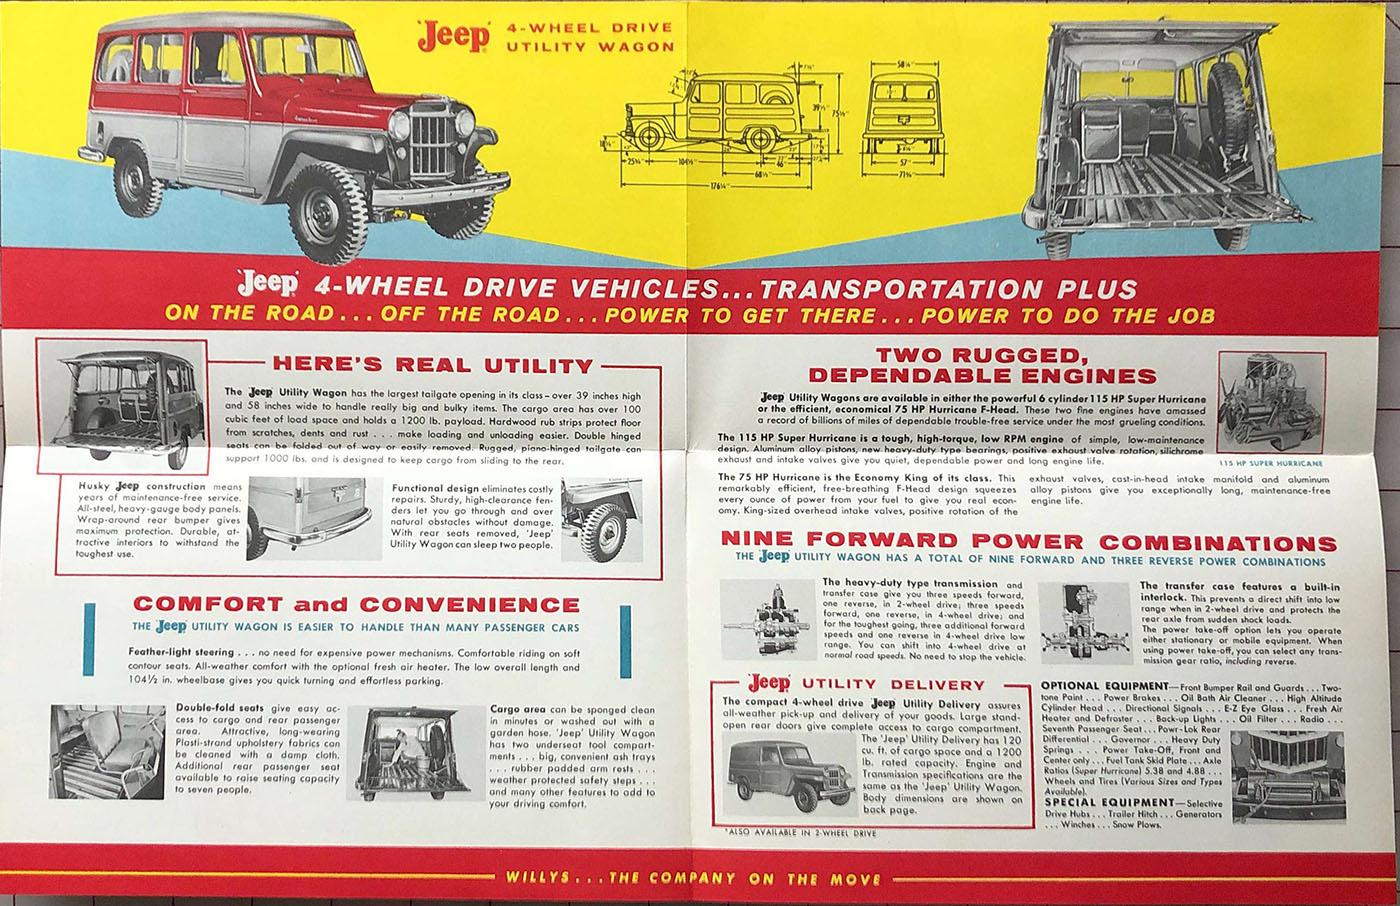 1955 WILLYS CJ-5 JEEP 4-WHEEL DRIVE ORIGINAL BROCHURE 55 CATALOG W-239-5 ?